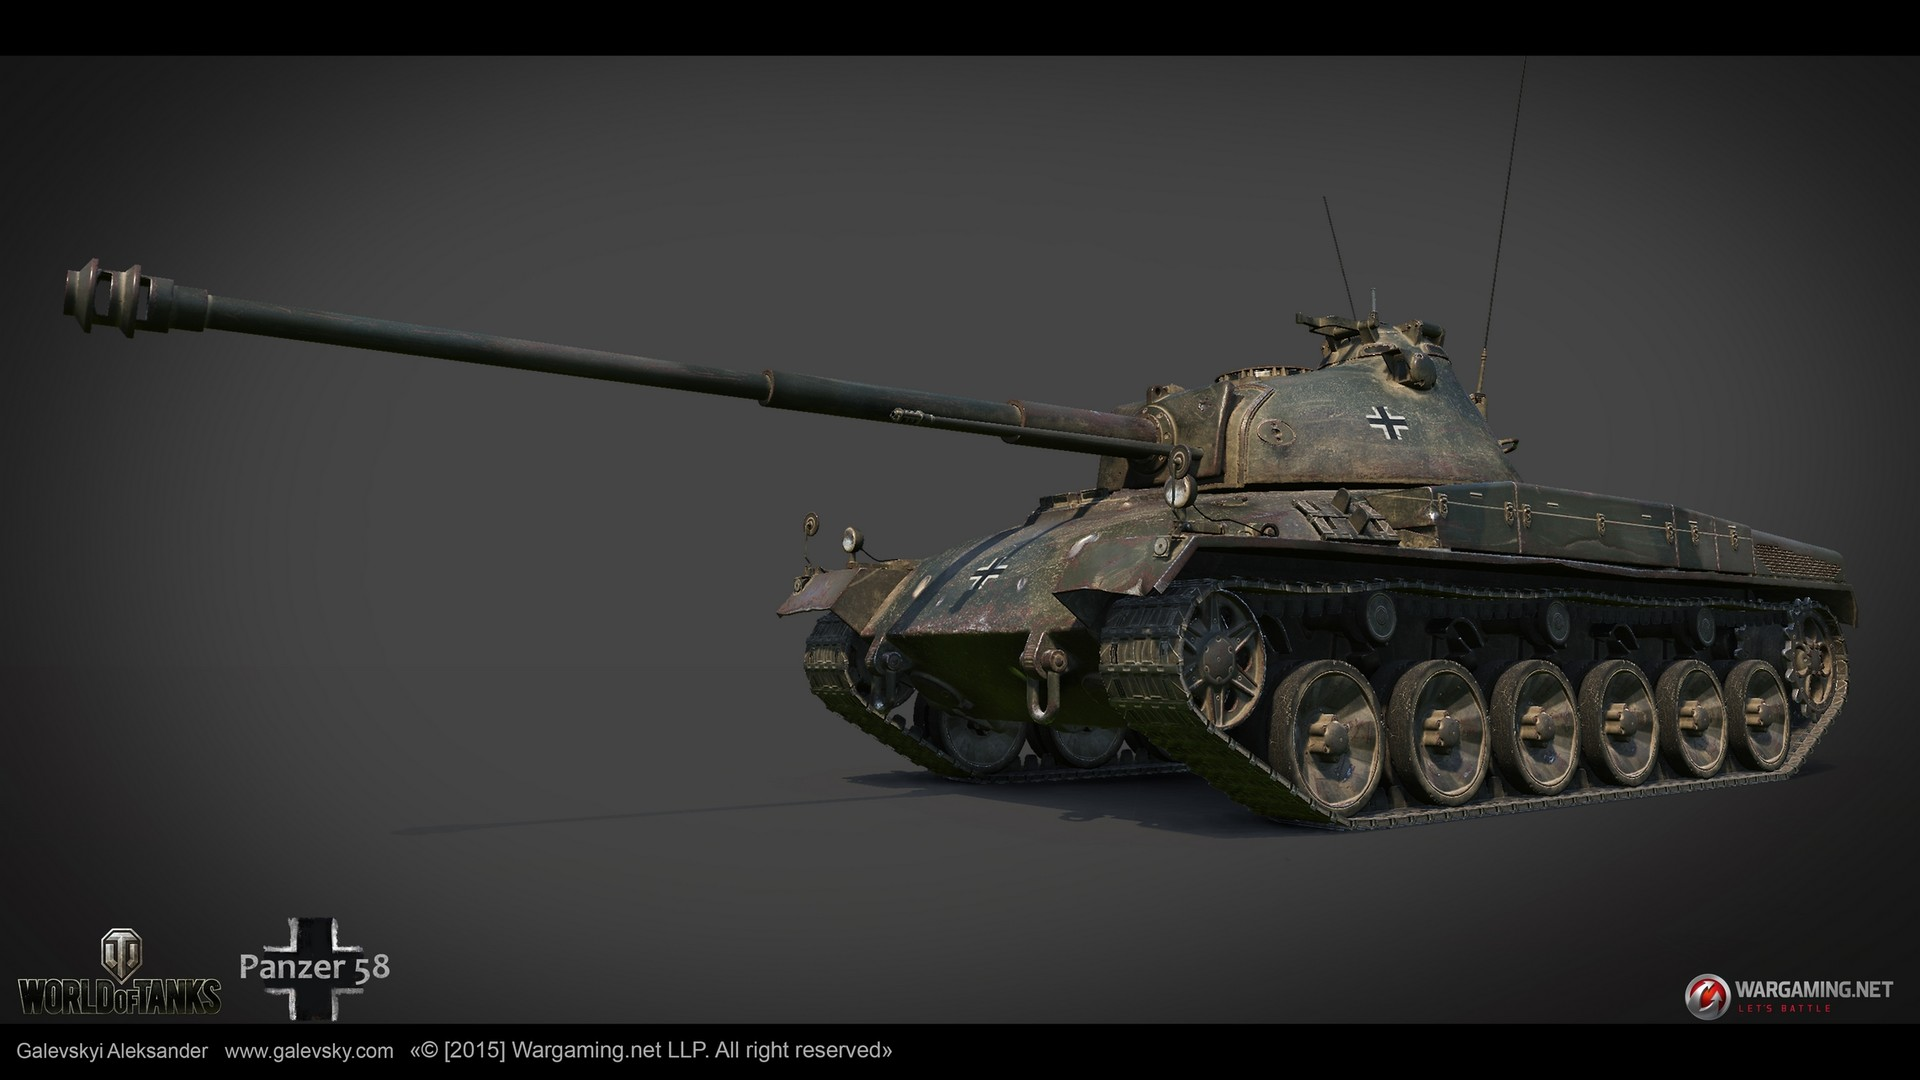 Aleksander galevskyi panzer 58 01 med